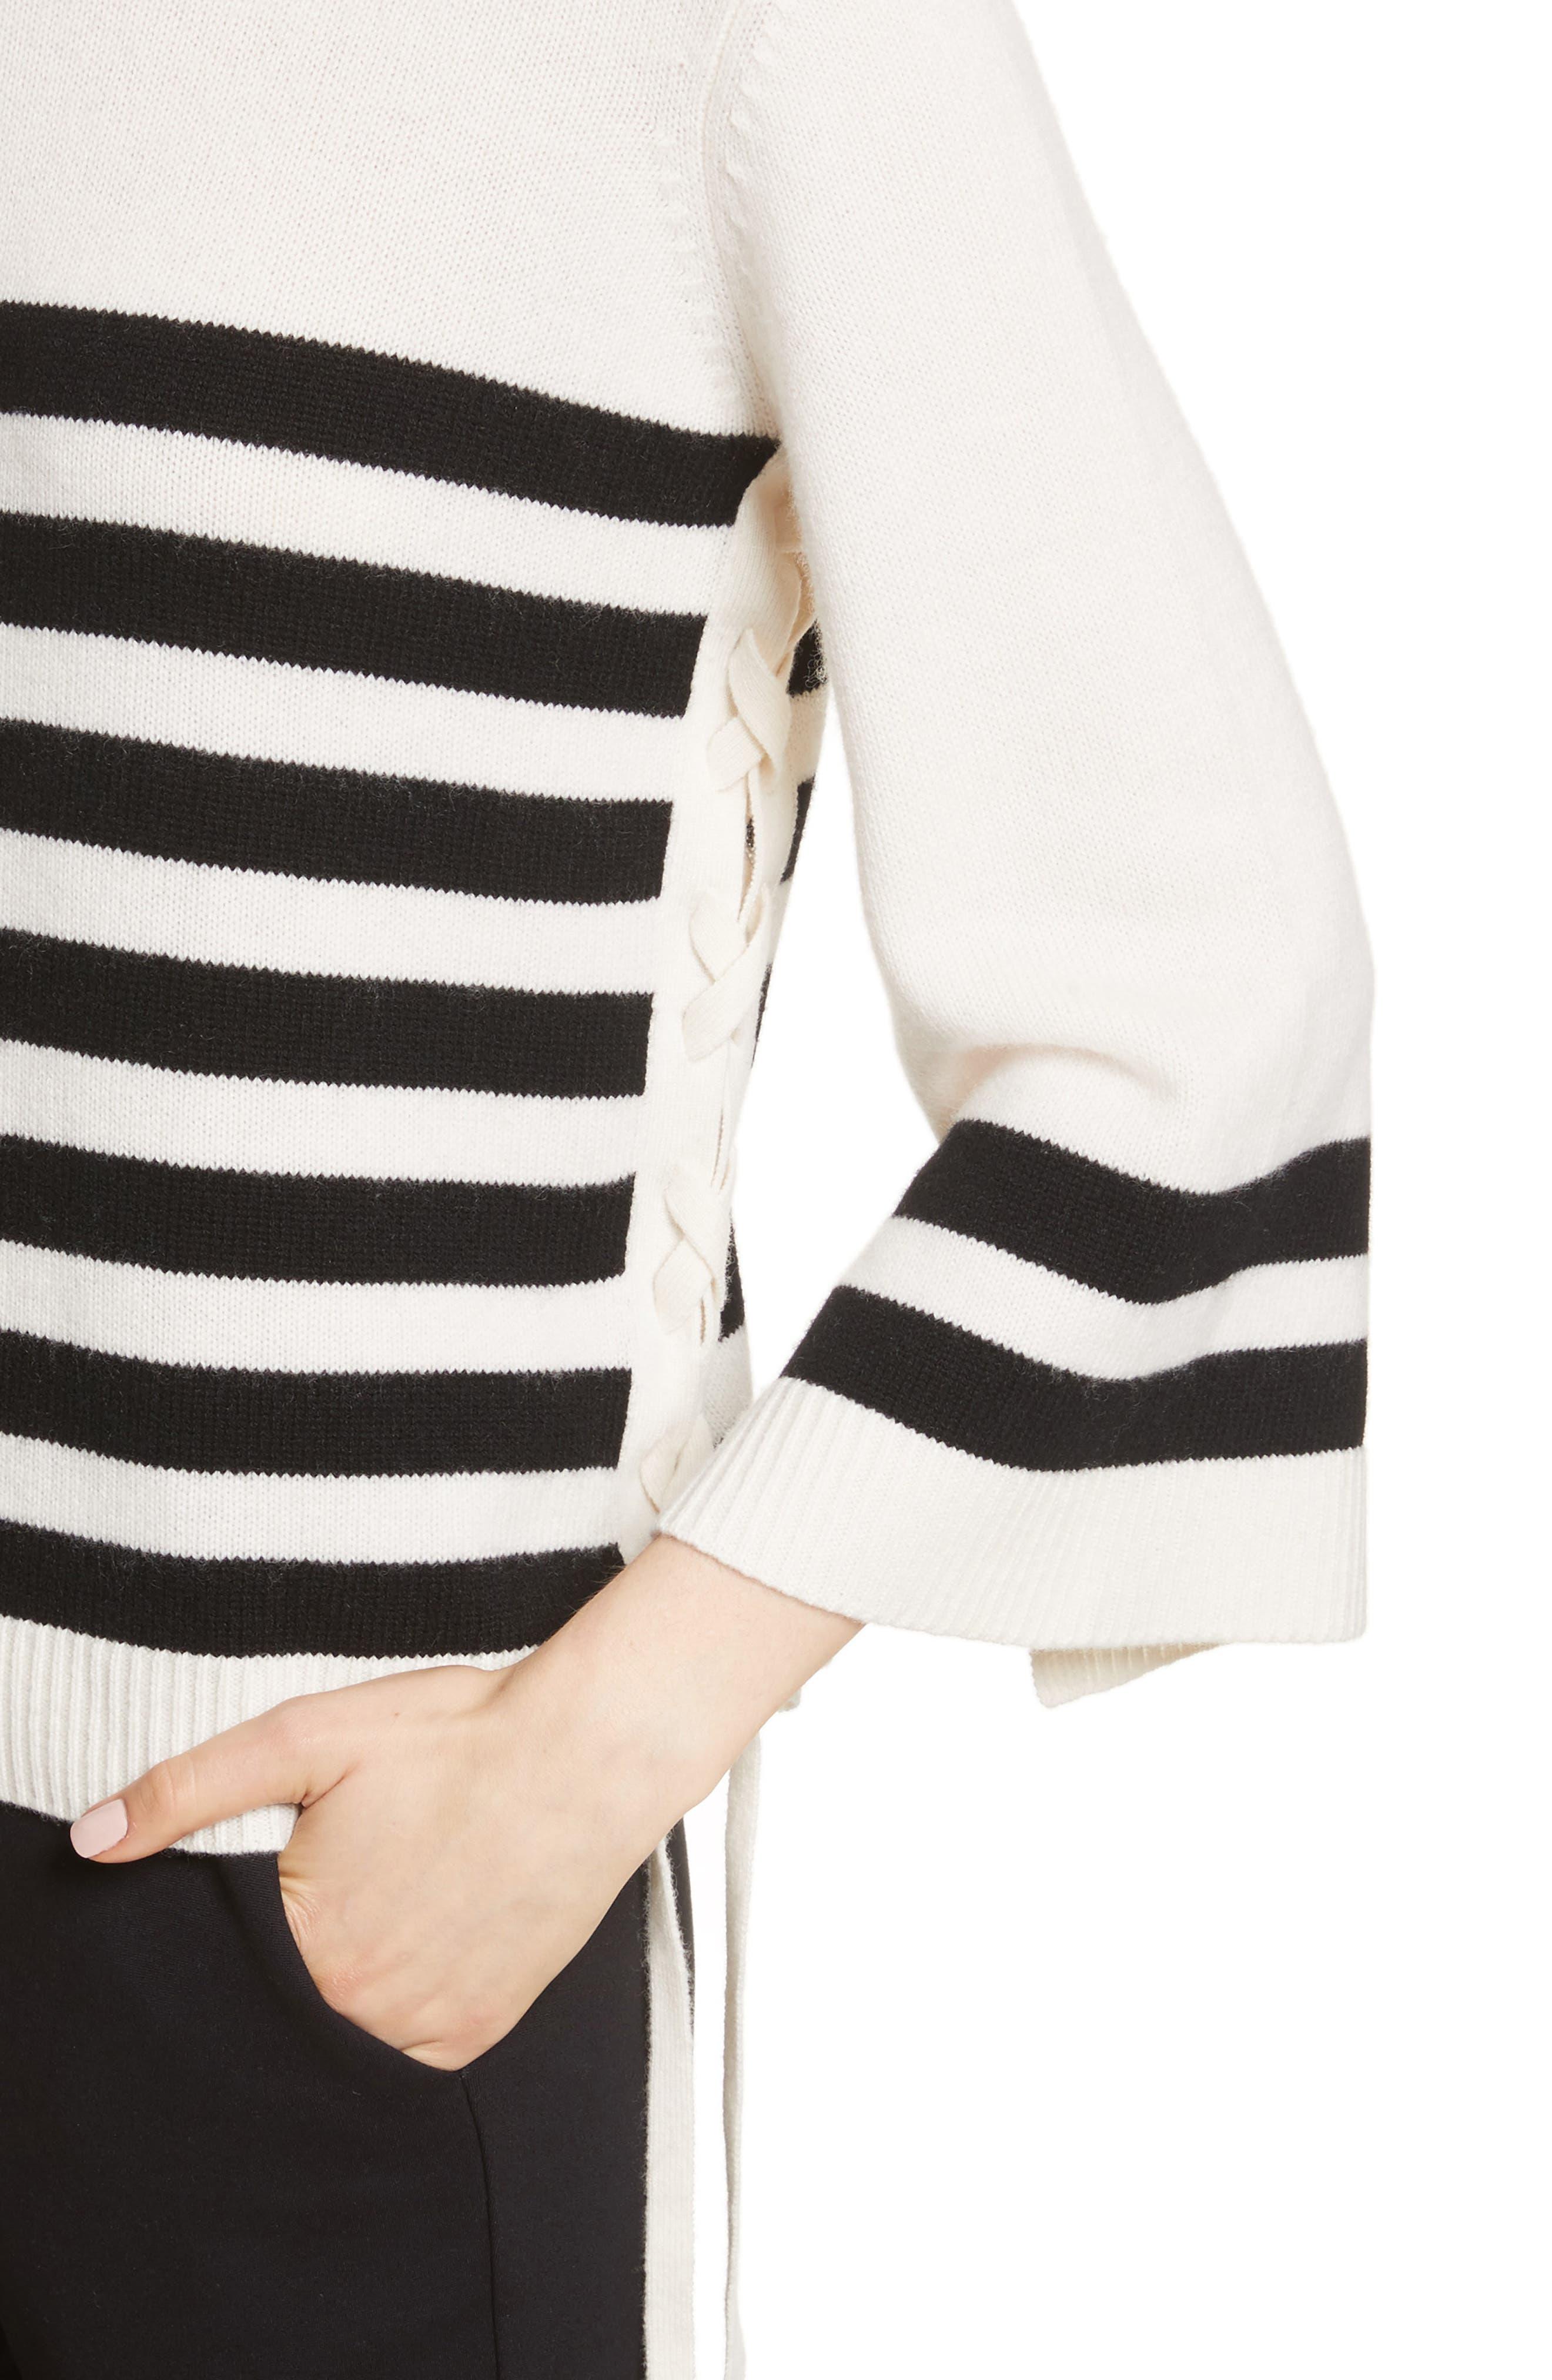 Lantz Mariner Sweater,                             Alternate thumbnail 4, color,                             Porcelain/ Caviar